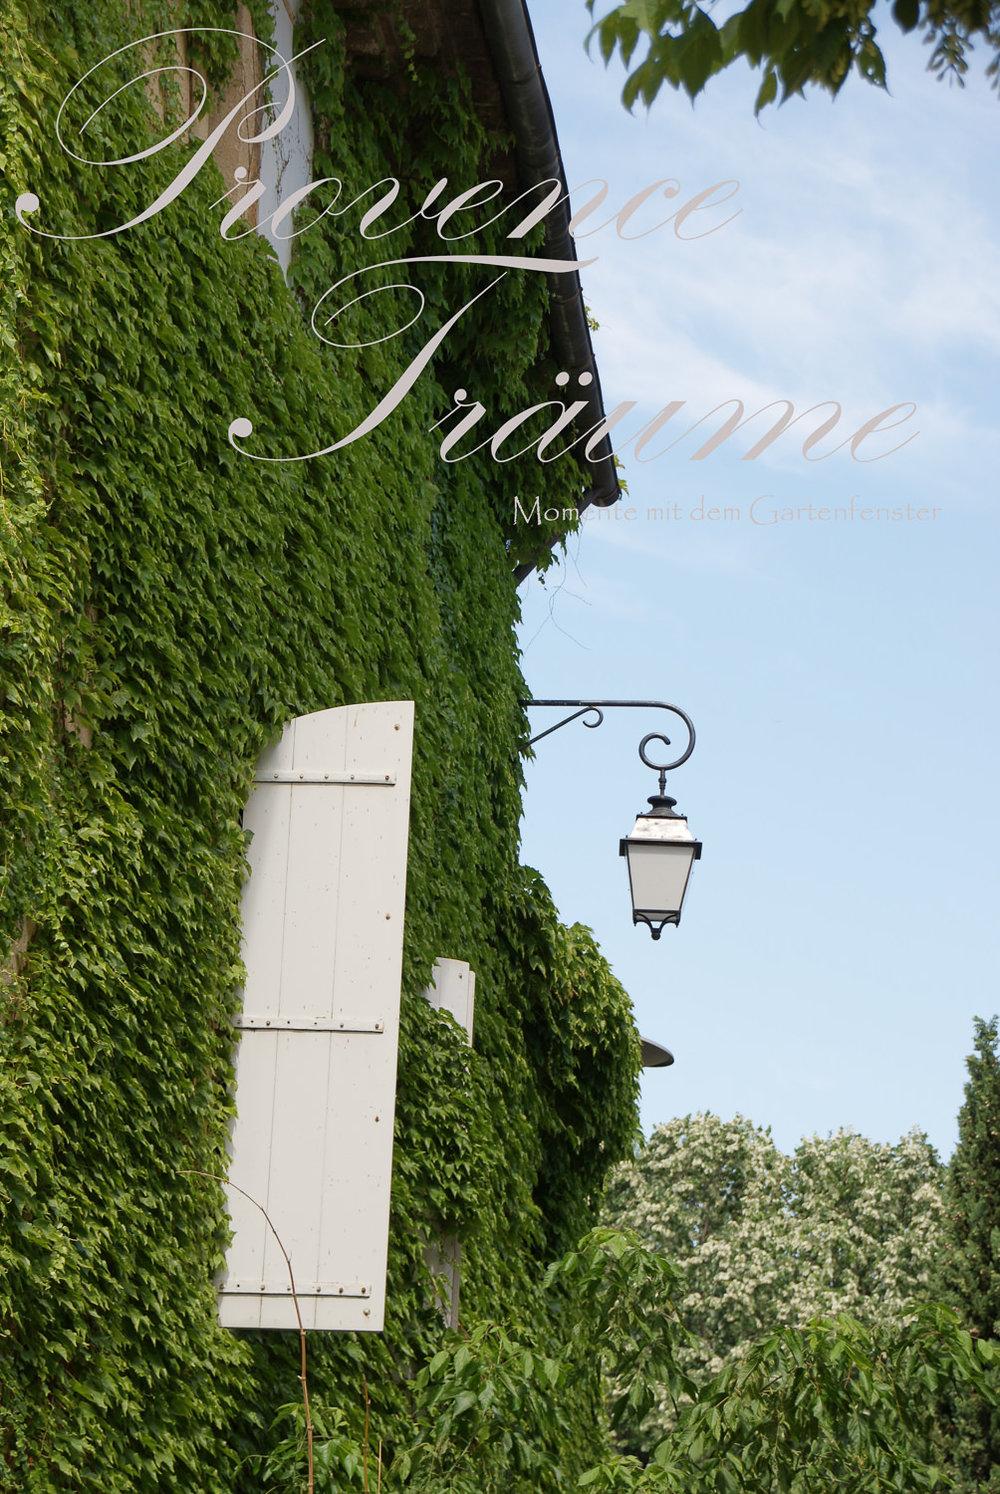 076_Lavendel Provence Gartenfenster.jpg